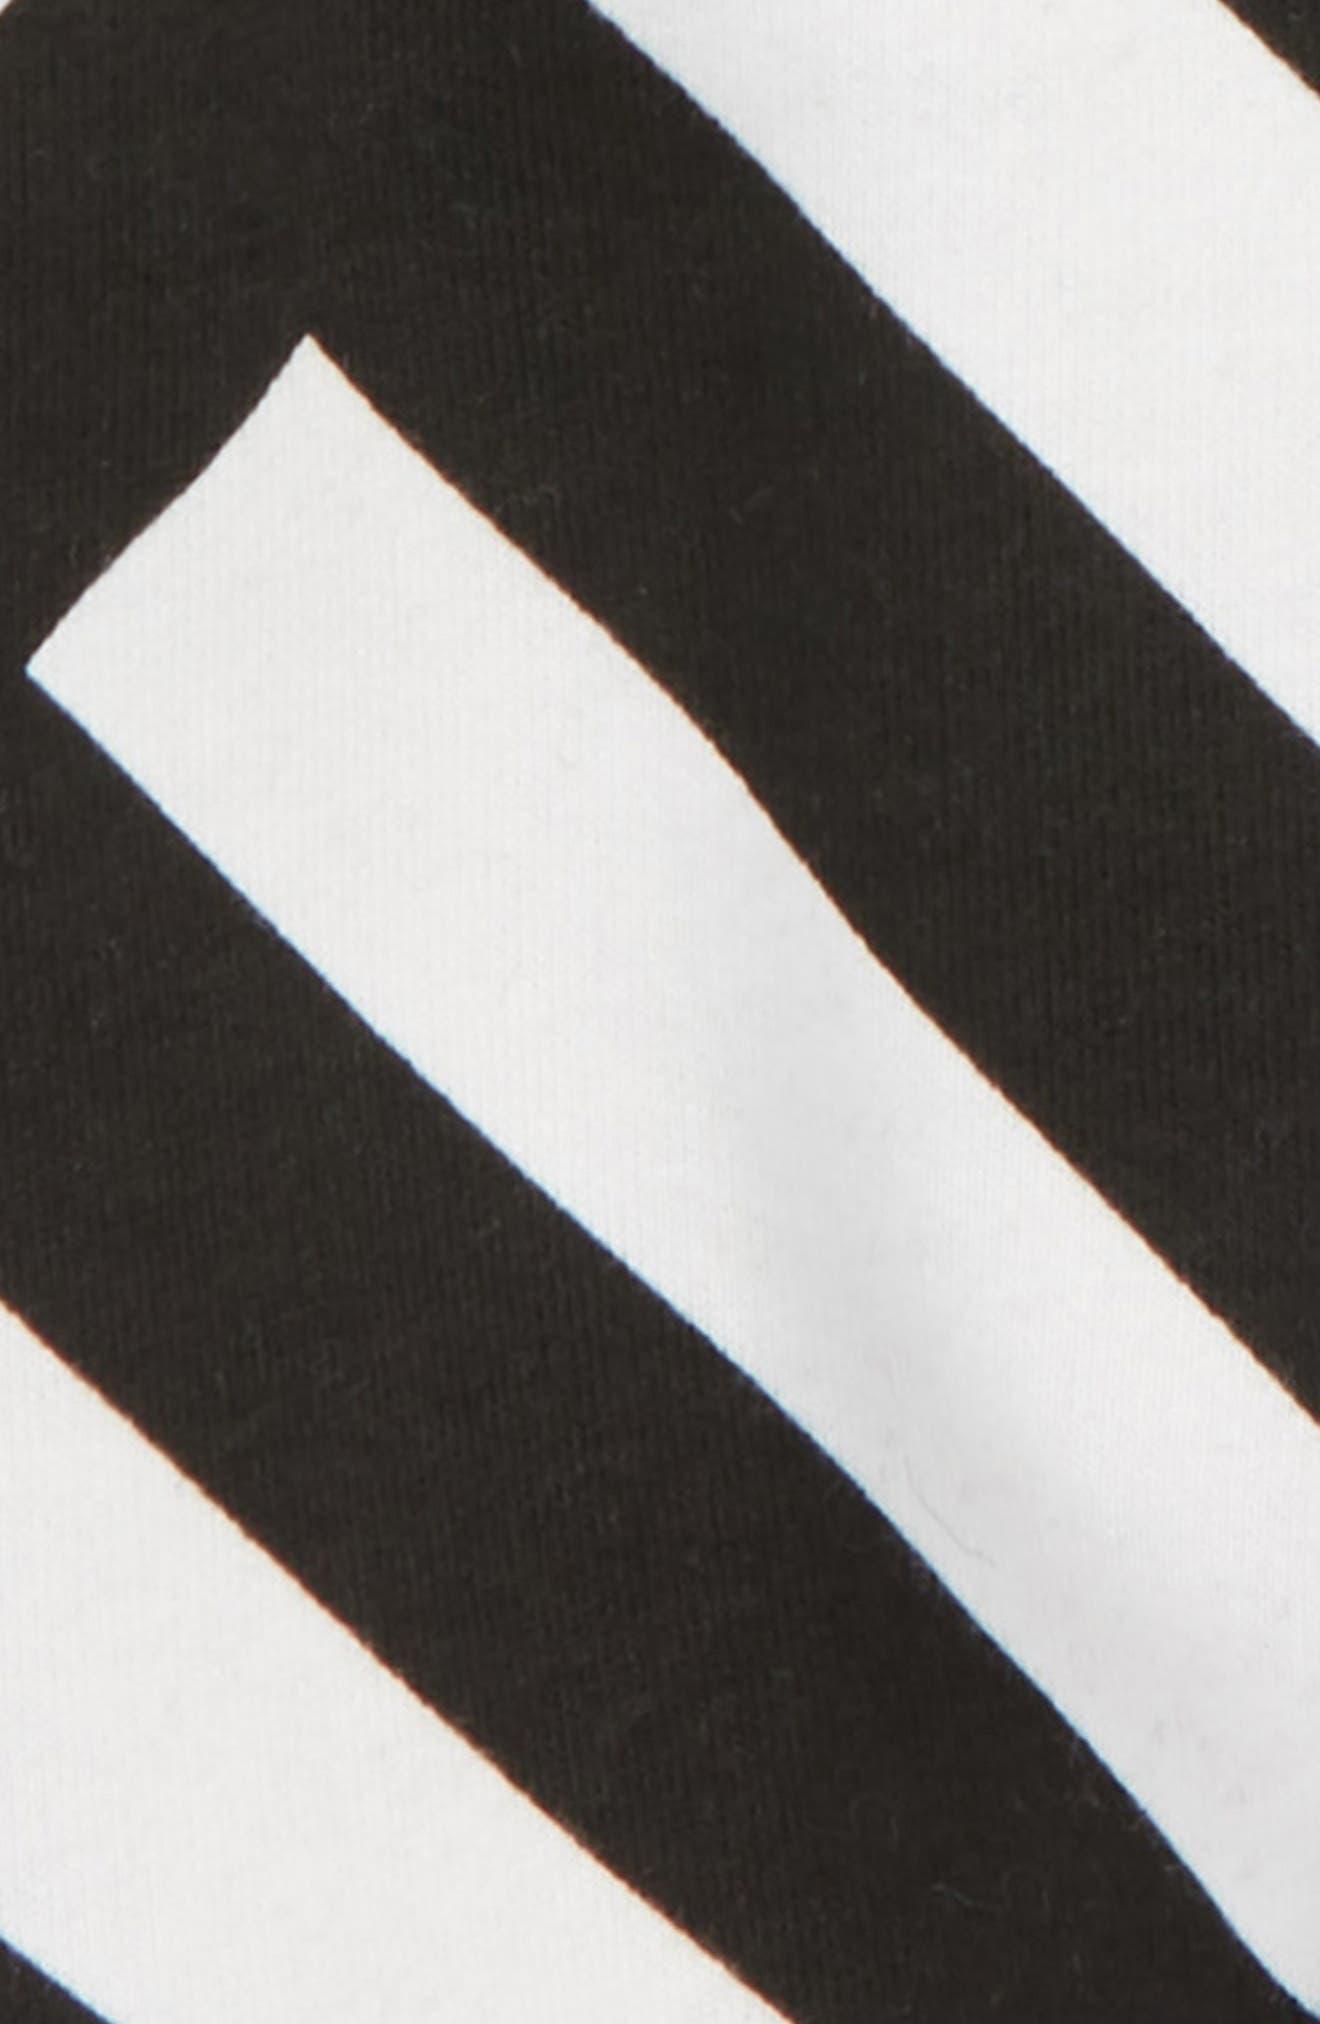 Stripe Baggy Pants,                             Alternate thumbnail 2, color,                             003